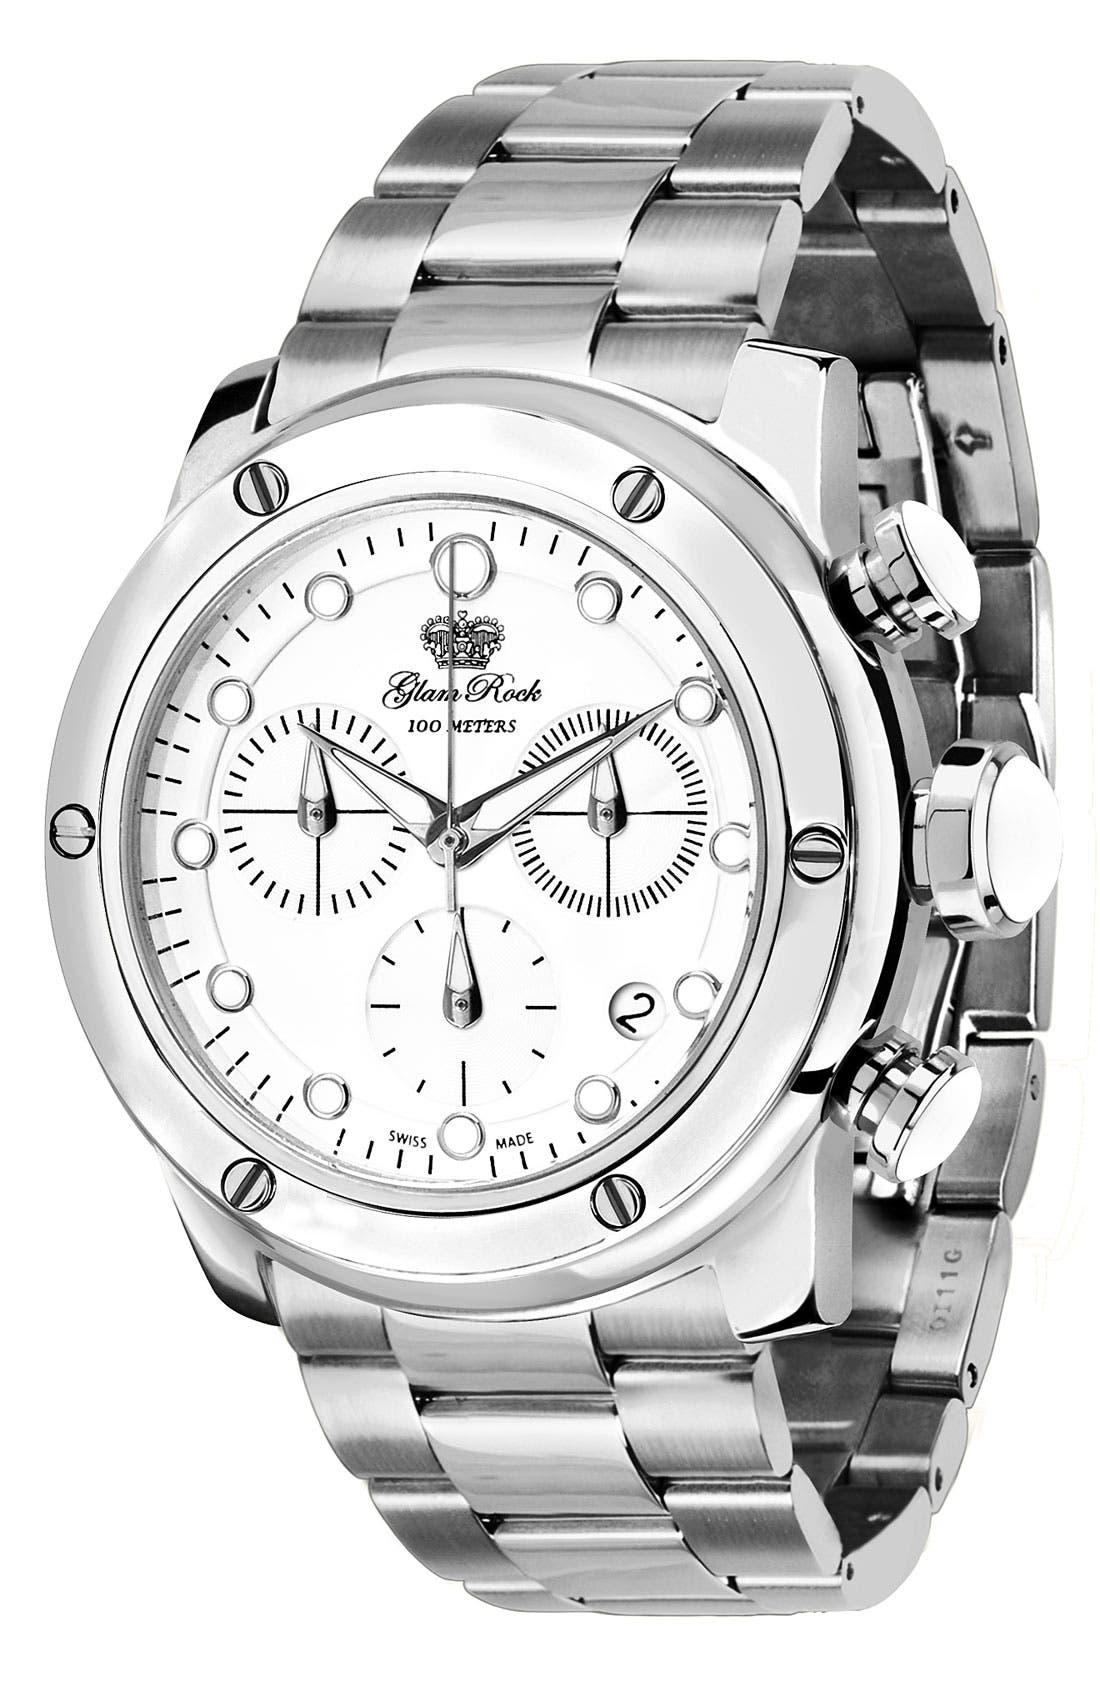 Main Image - Glam Rock 'Aqua Rock' Chronograph Bracelet Watch